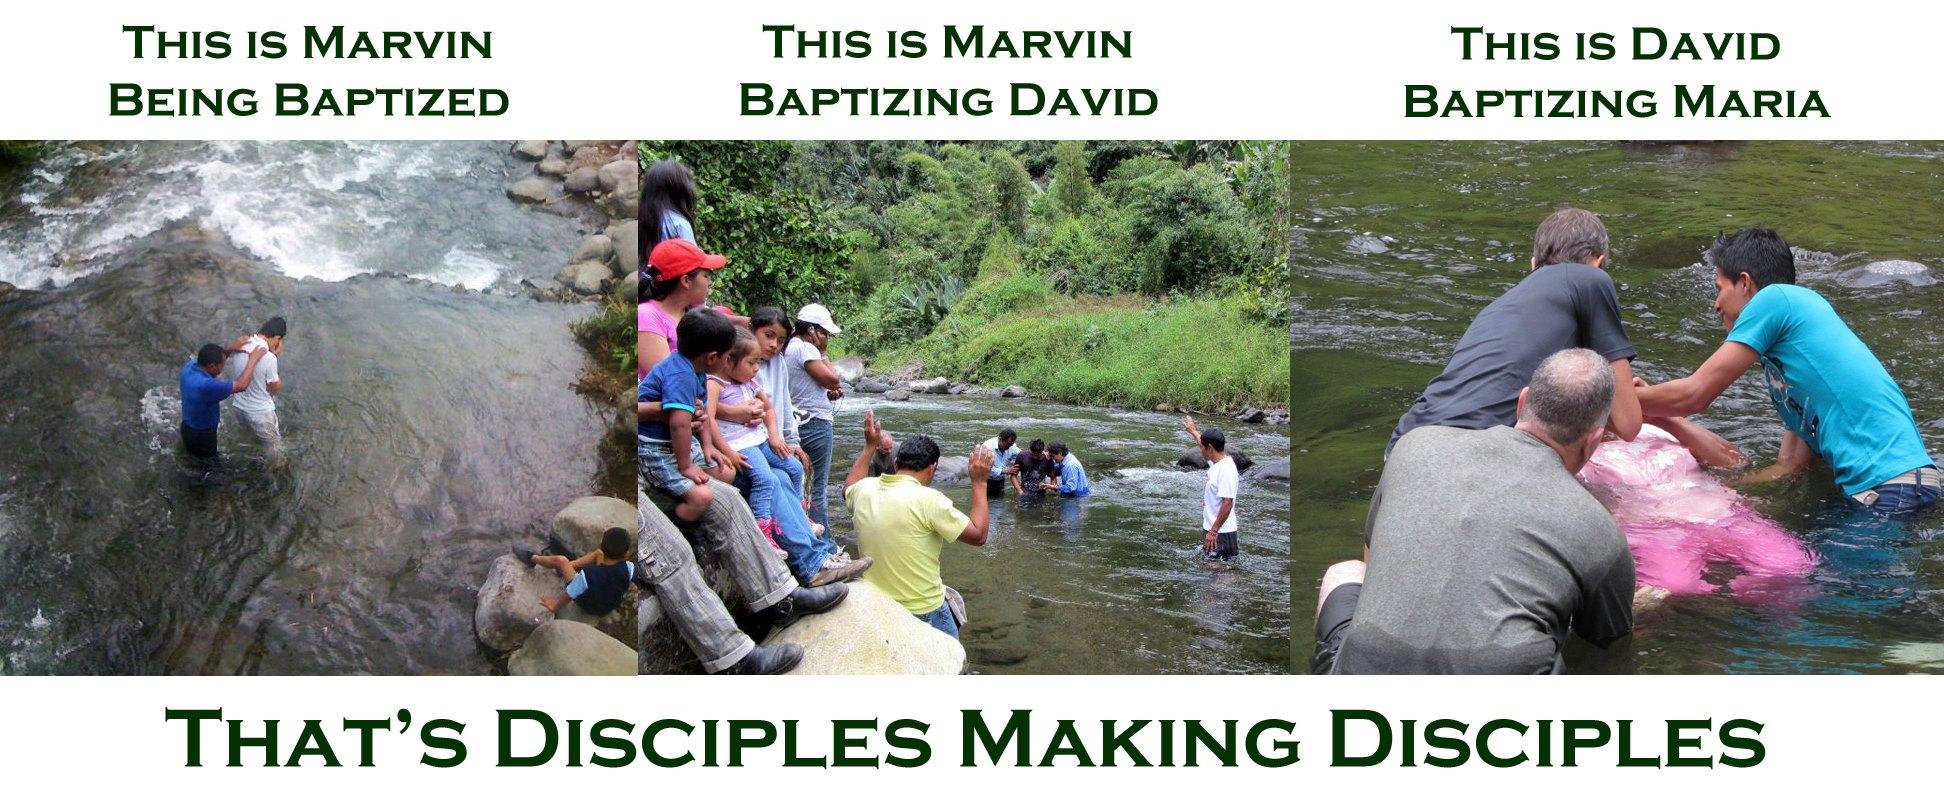 Photo credit: https://twitter.com/Missionaries